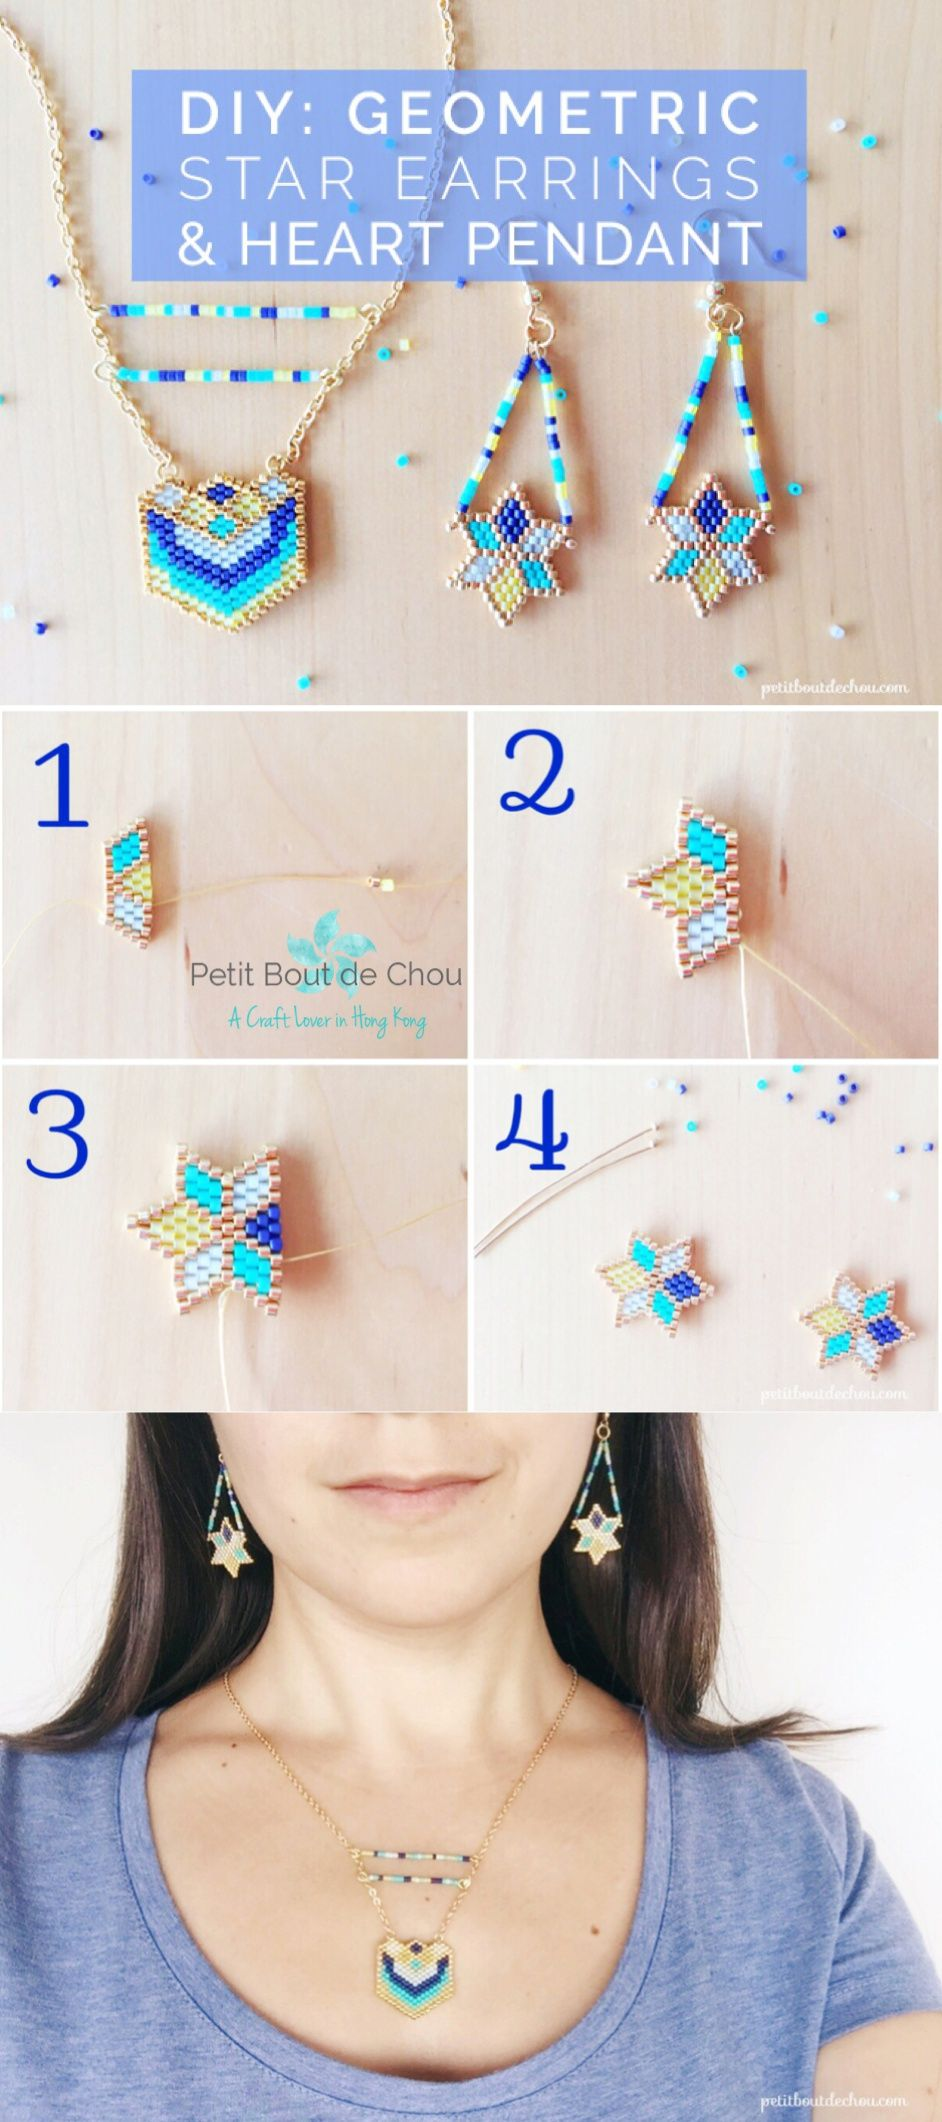 Diy geometric miyuki star earrings and heart pendant star